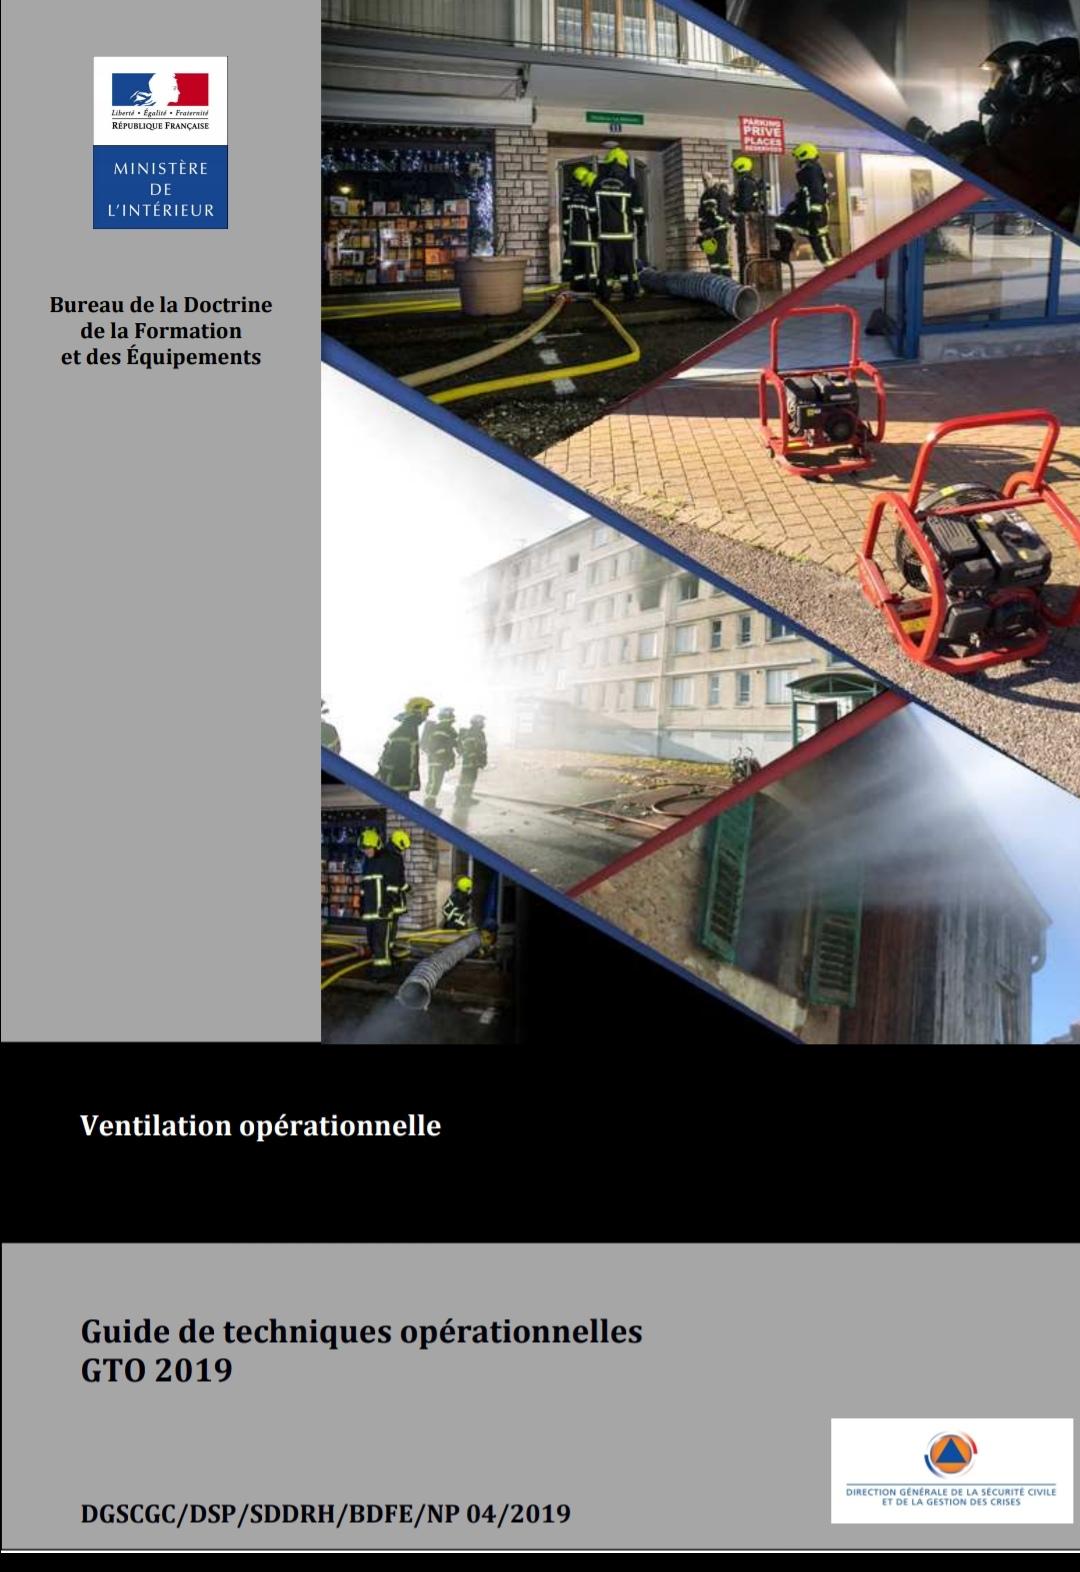 GTO ventilation opérationnelle